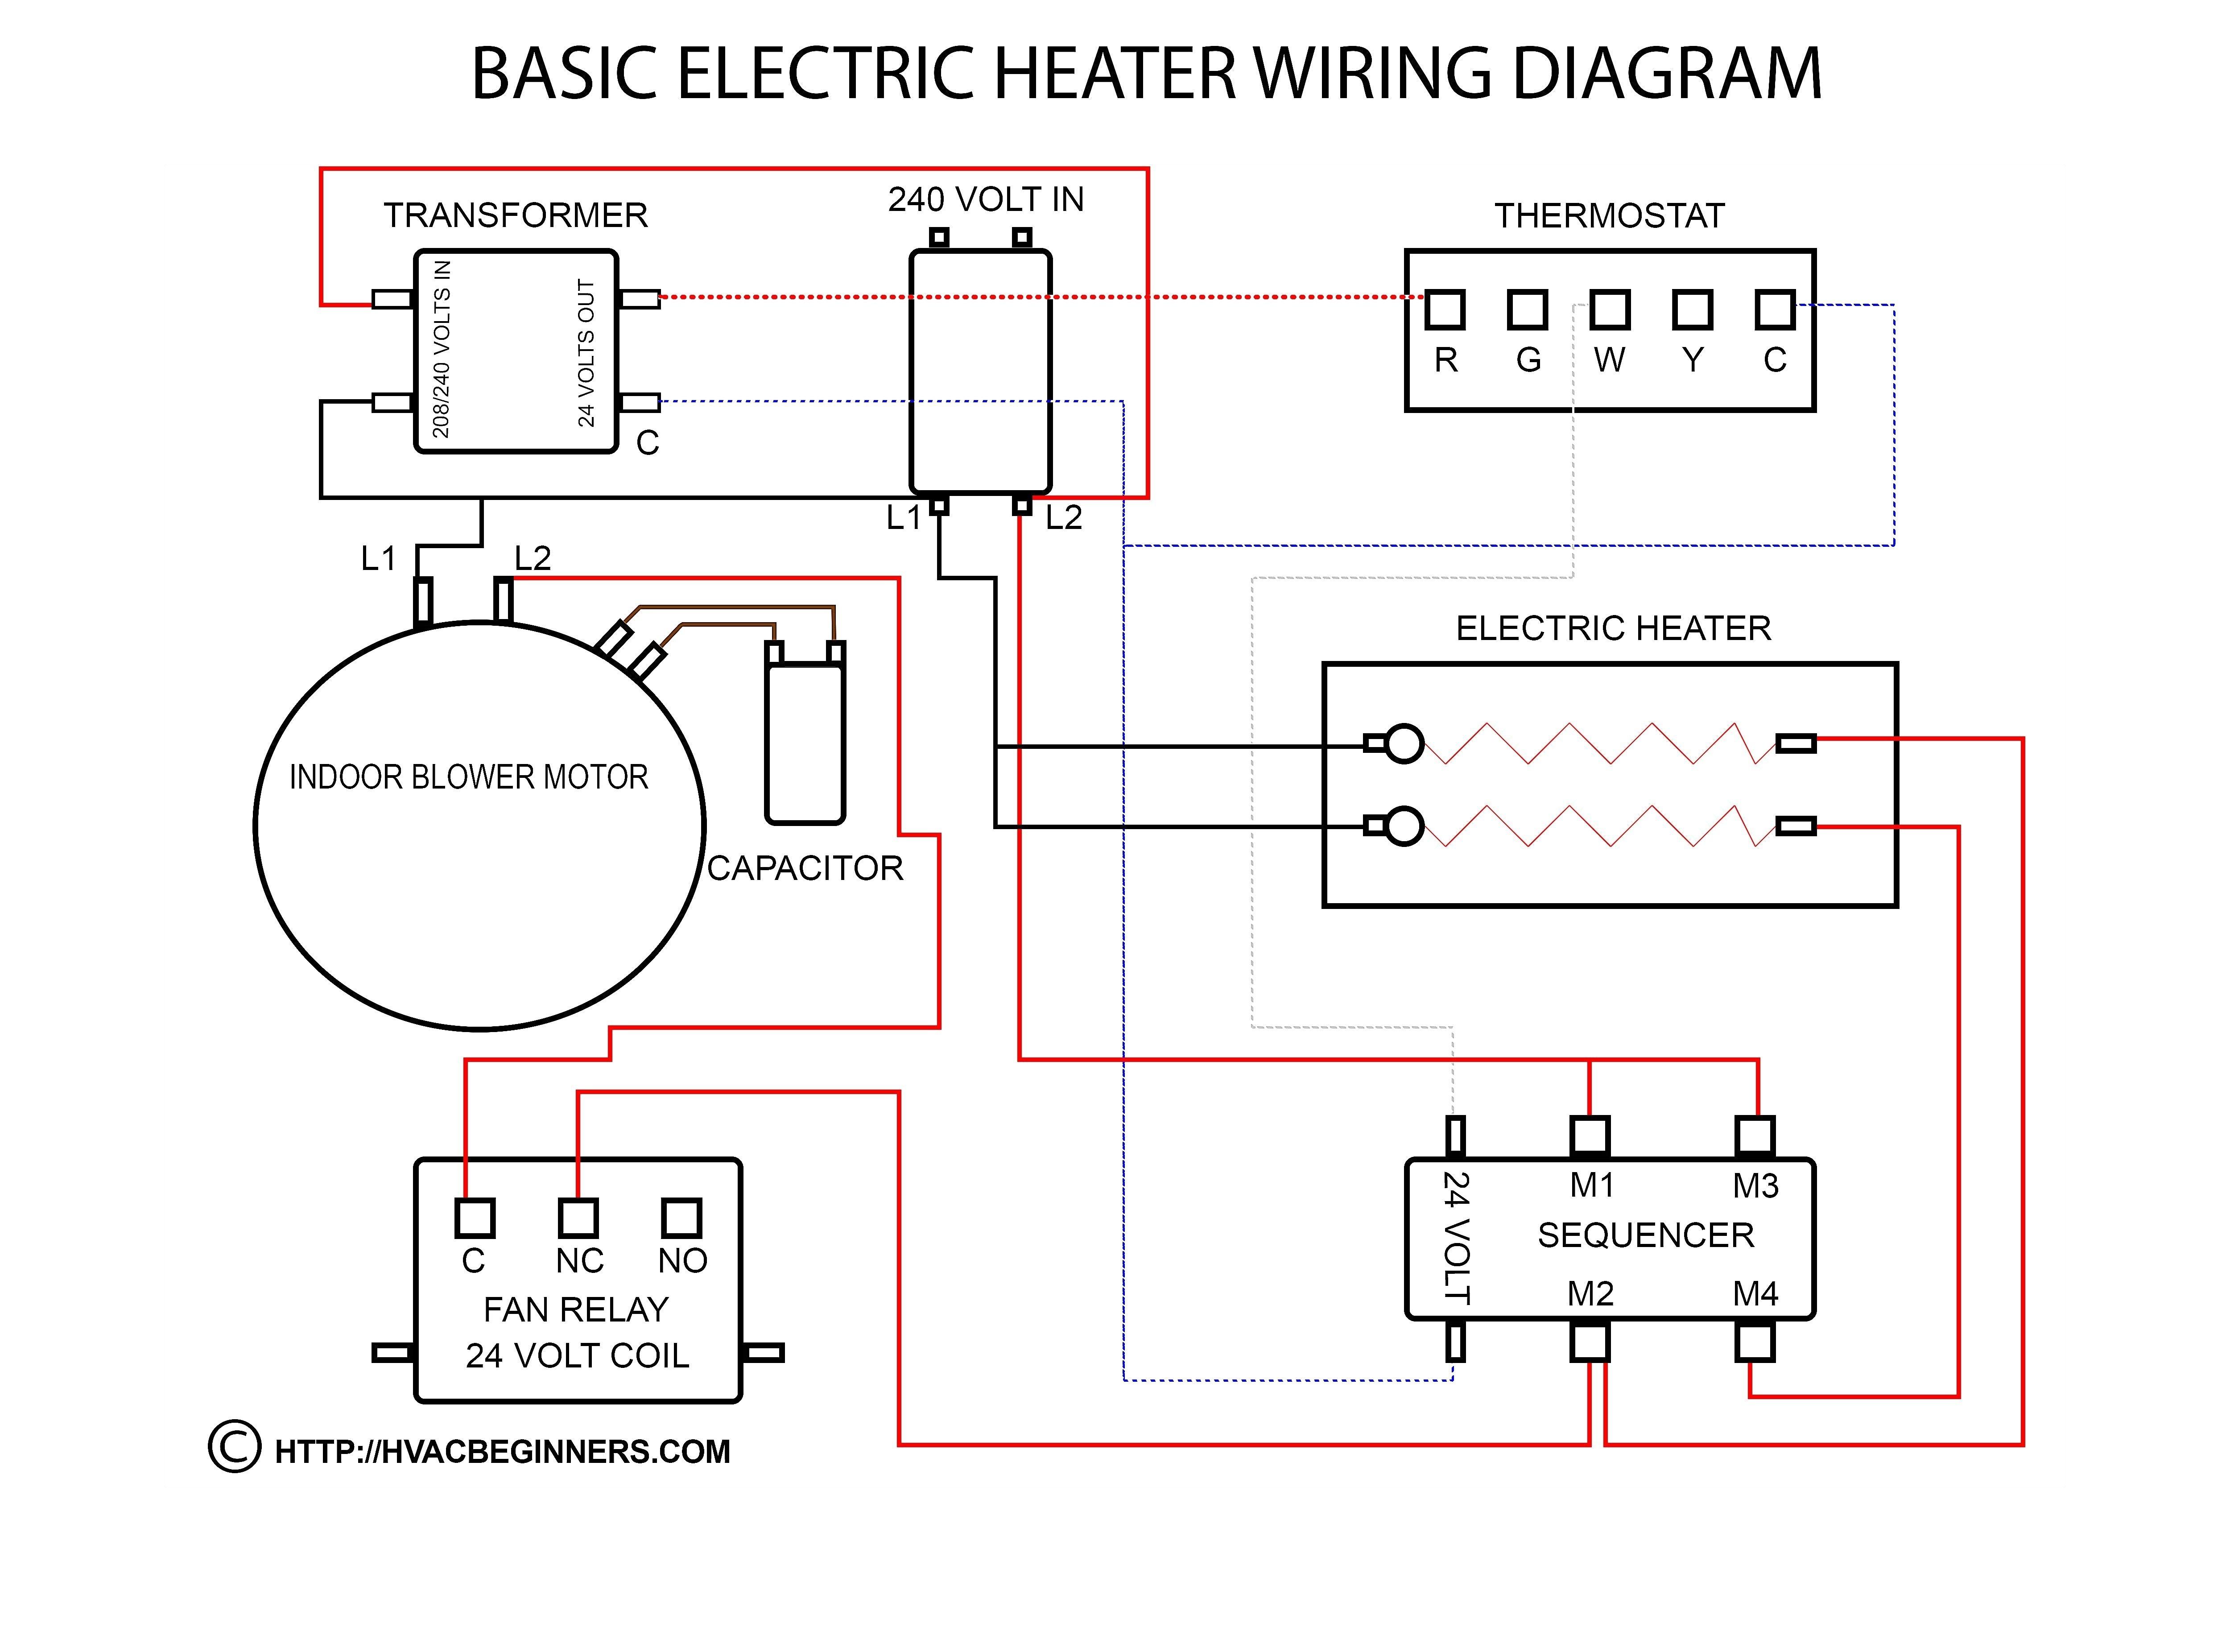 Weathertron thermostat Wiring Diagram Trane Weathertron thermostat Wiring Diagram In Oil Furnace Inside 7 Of Weathertron thermostat Wiring Diagram